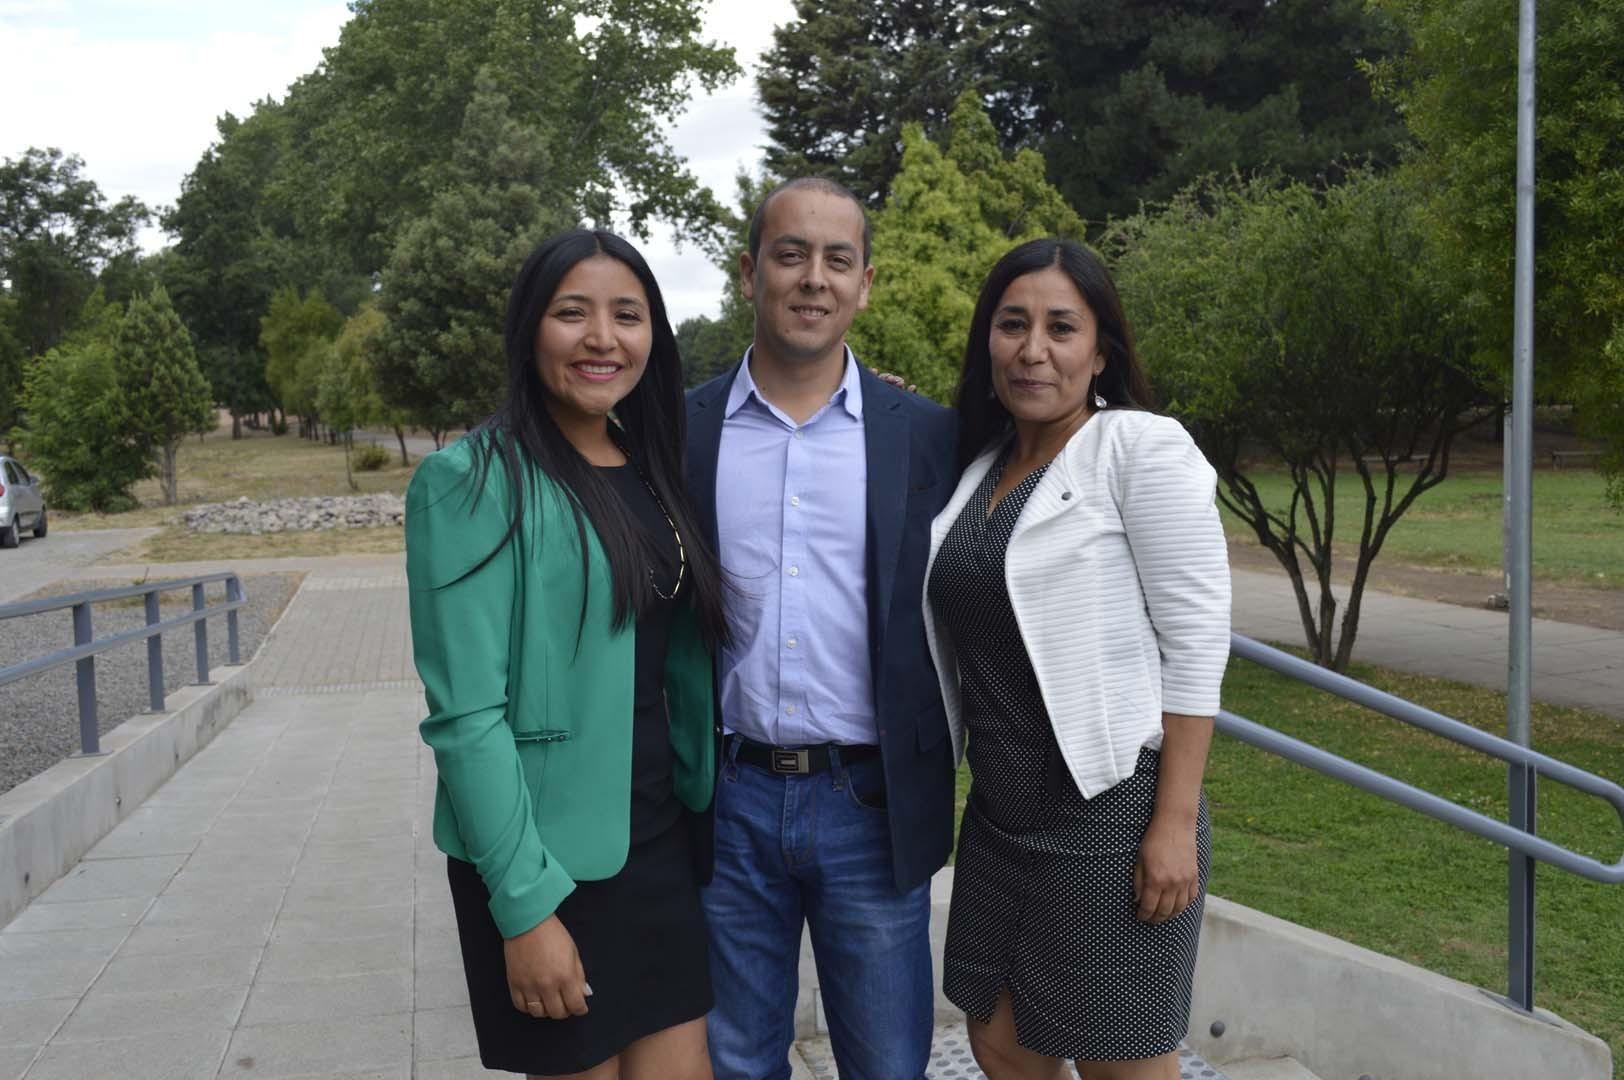 Marlene Parra, Kim Acevedo y Rosa Ubilla